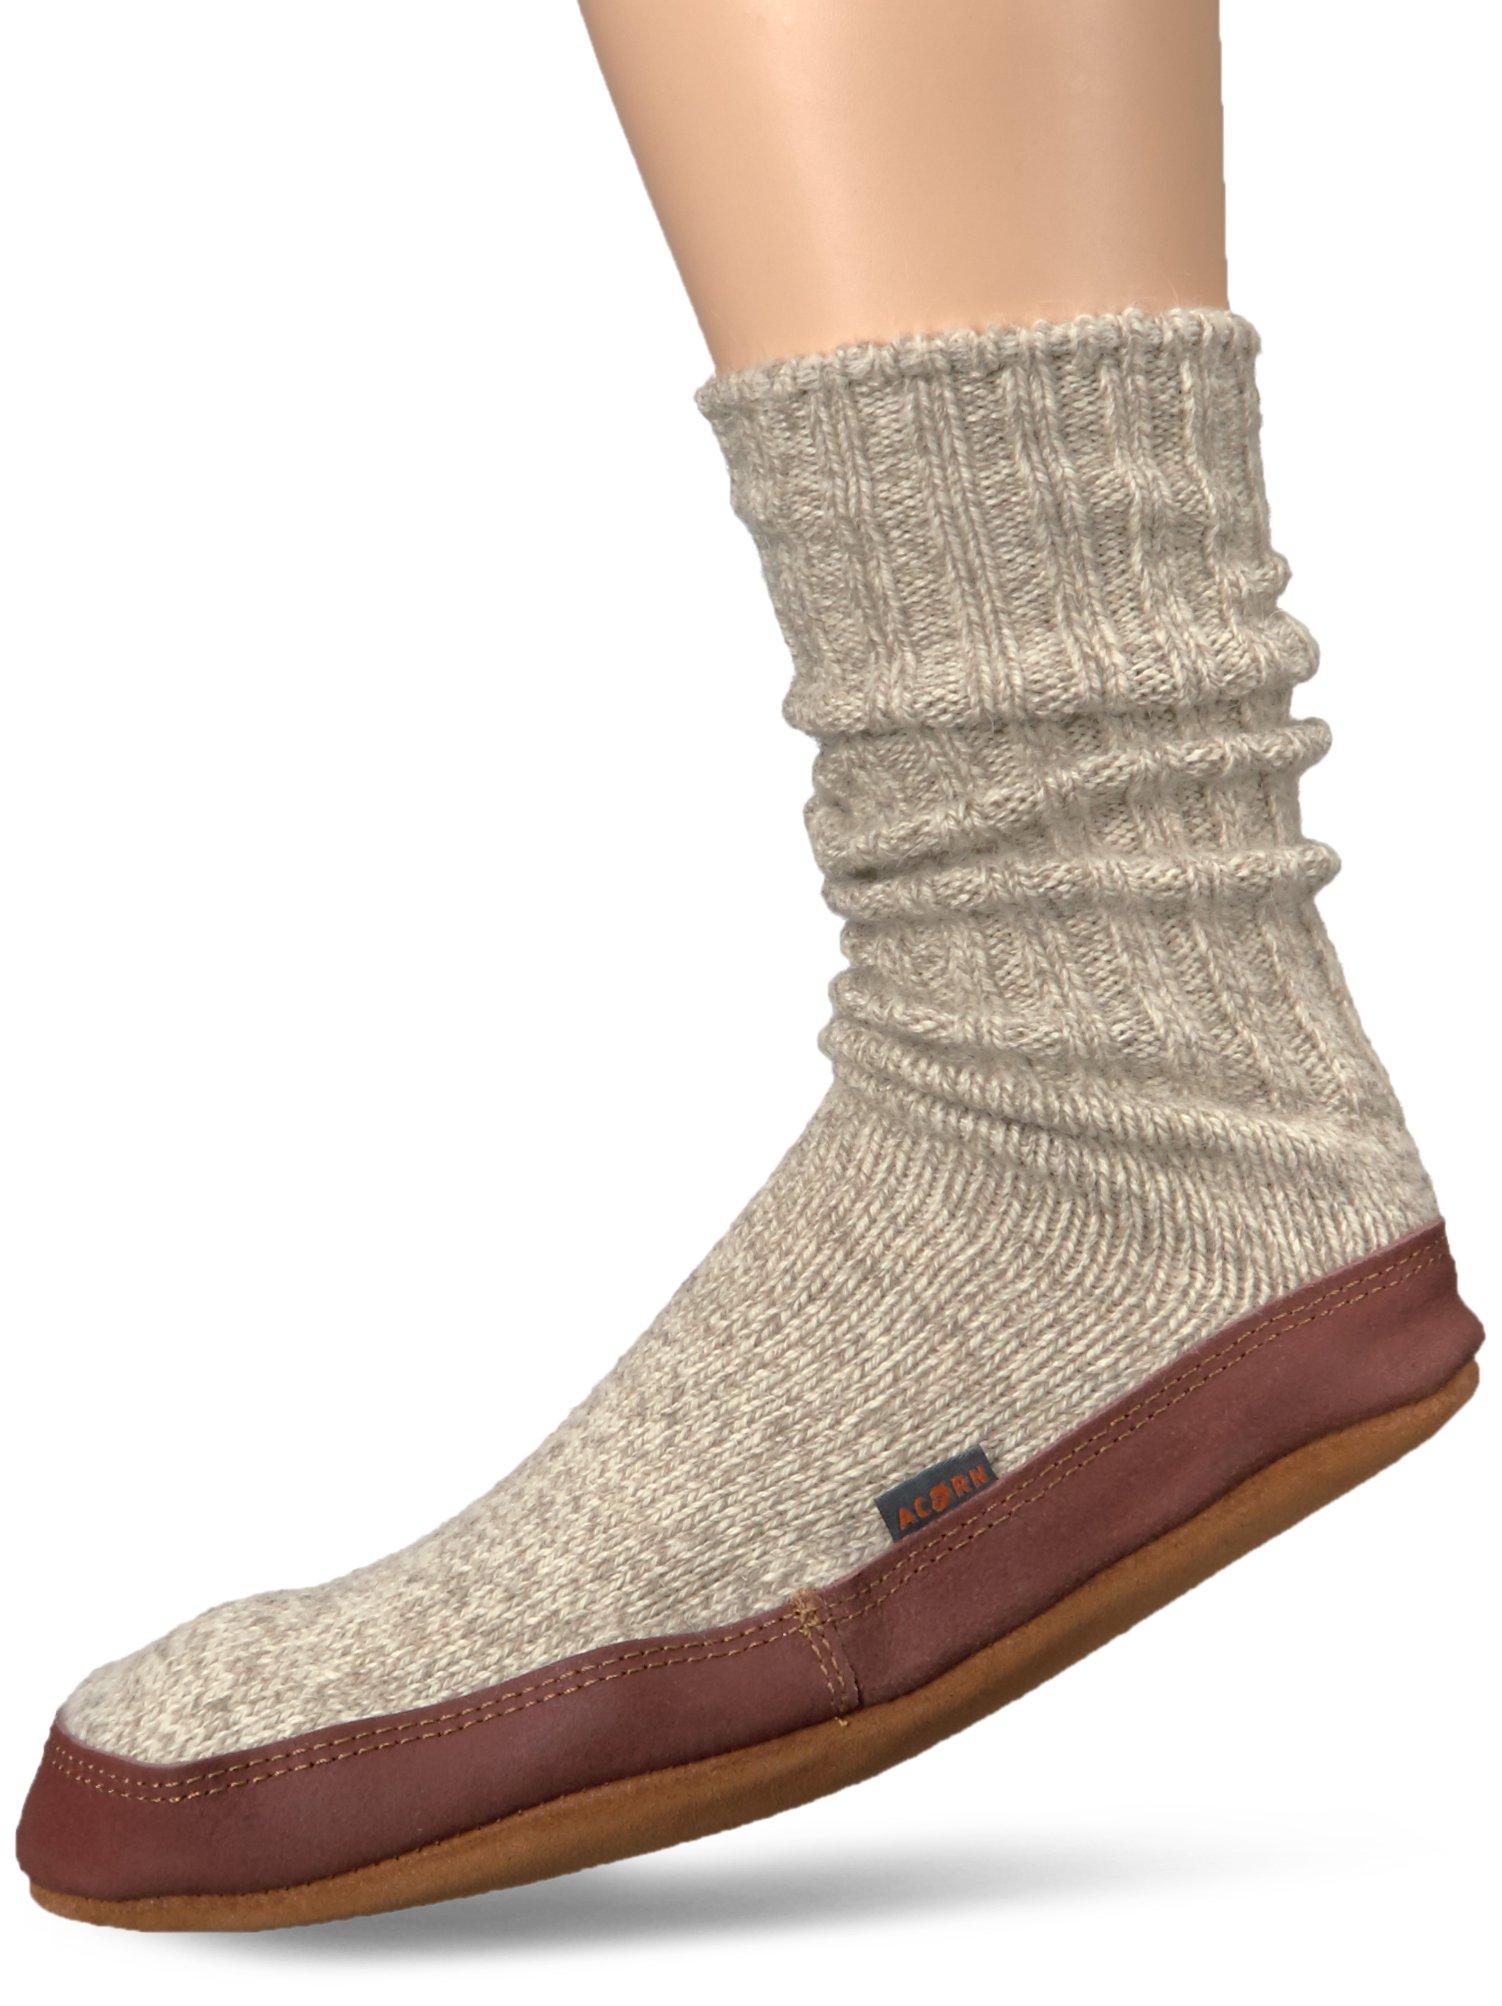 Acorn Unisex Sock Slipper, Light Grey Ragg Wool, XX-Large(12-13 Men's) B US